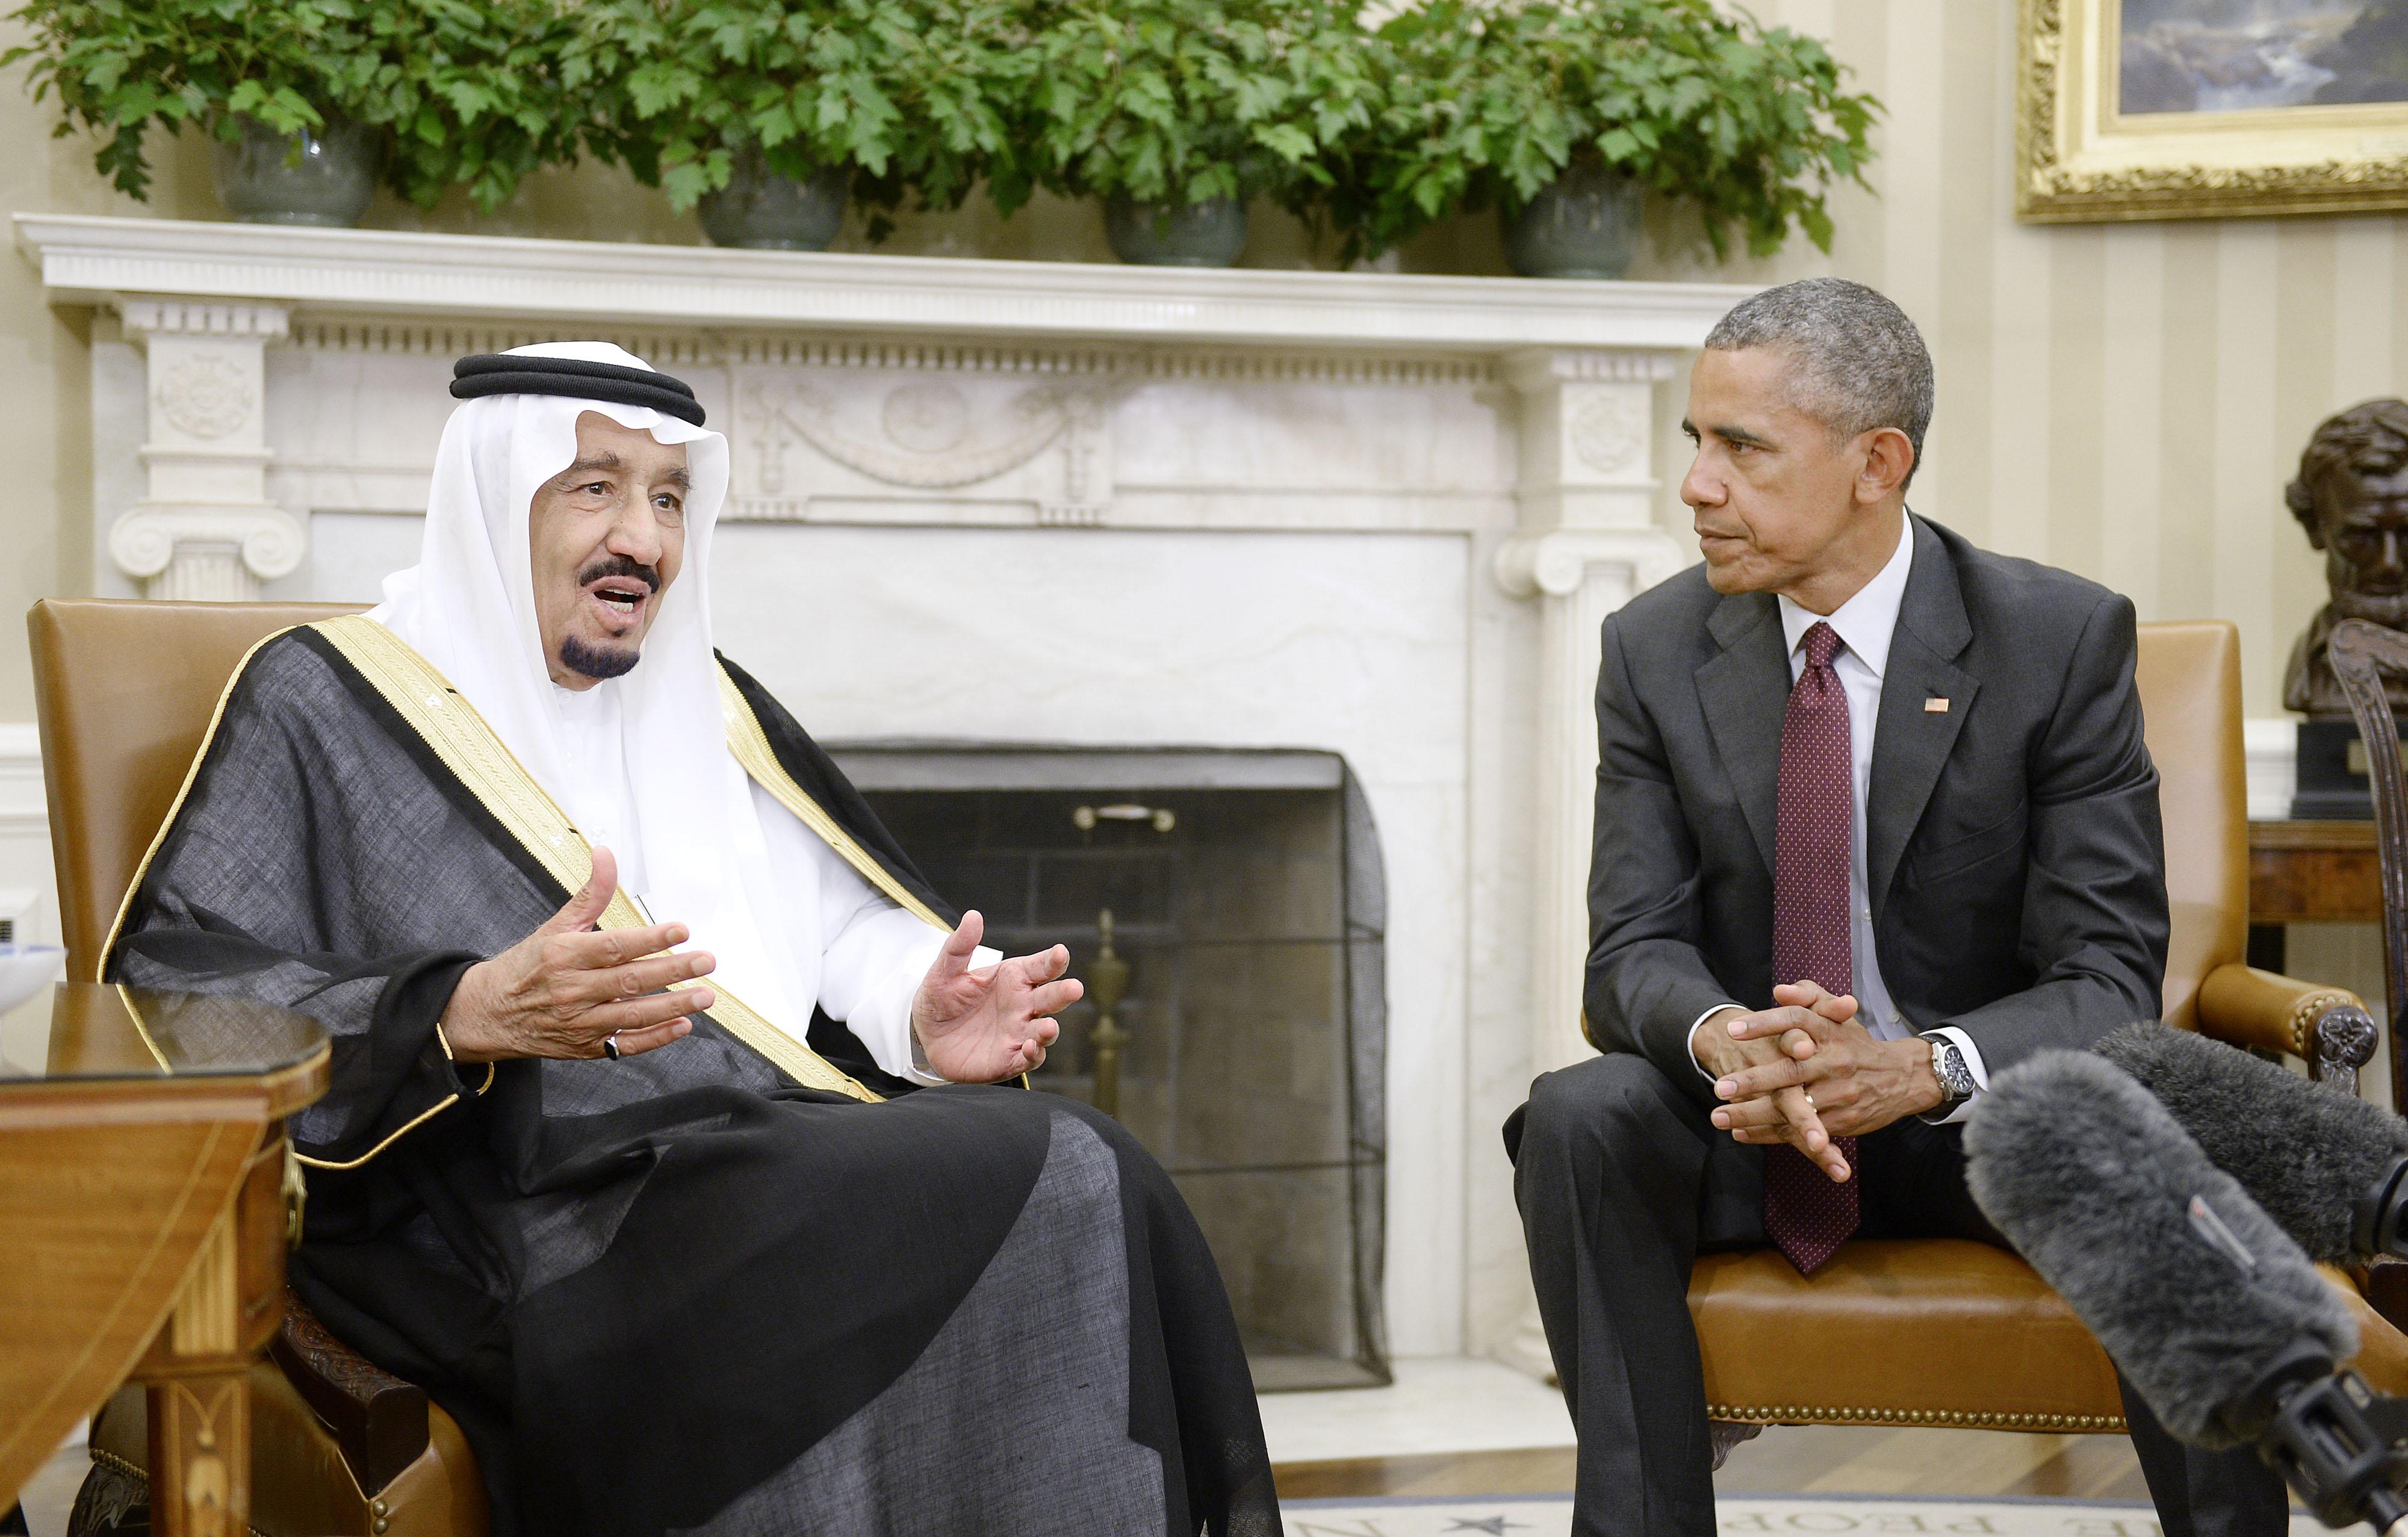 U.S. President Barack Obama looks on as King Salman bin Abd alaziz of Saudi Arabia speaks during a  bilateral meeting in the Oval Office of the White House in Washington, D.C., on Sept. 4, 2015.